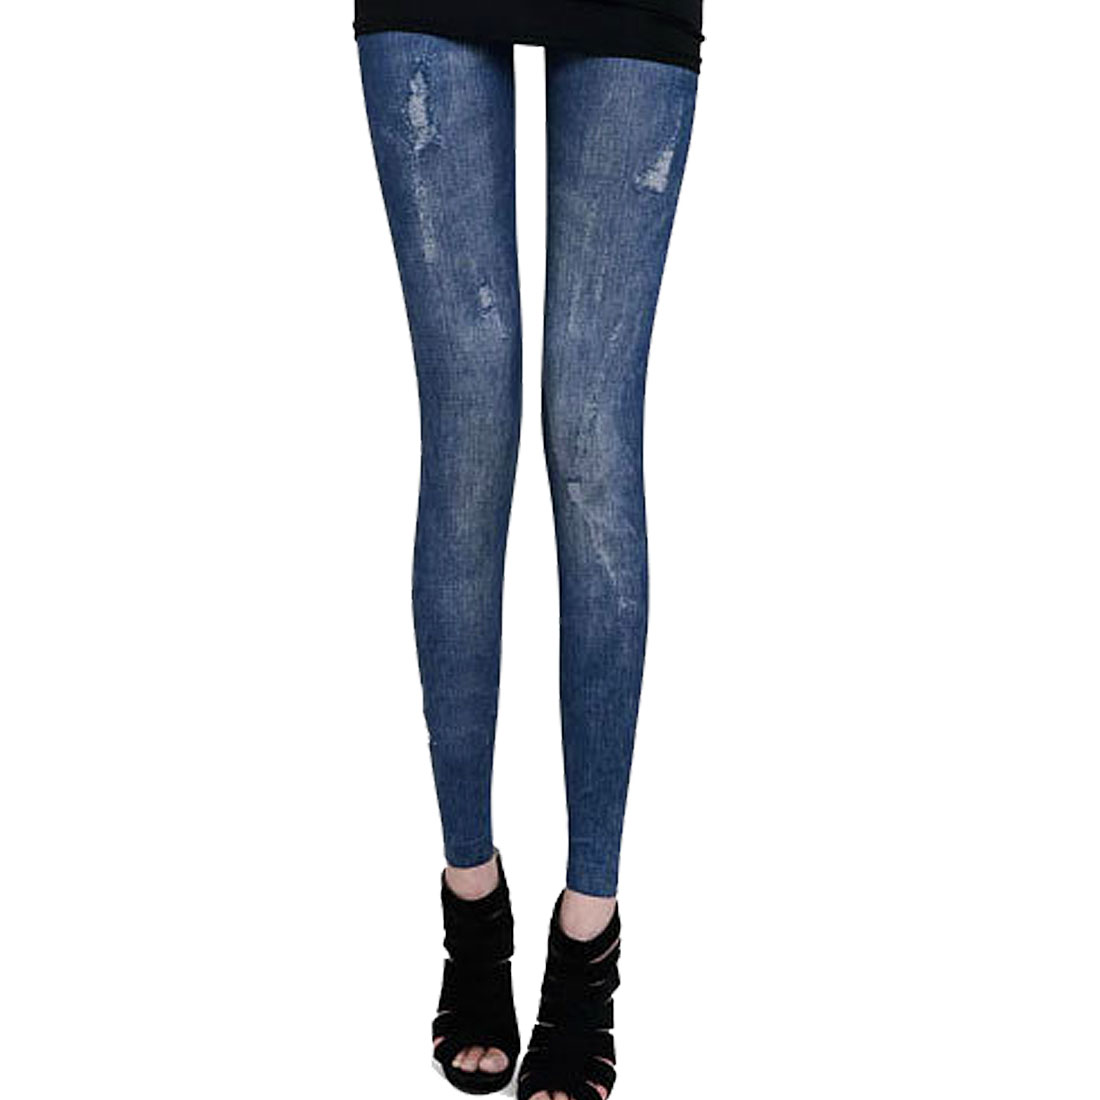 Women Destroy Pattern Stretchy Skinny Close-fitting Leggings Blue XS